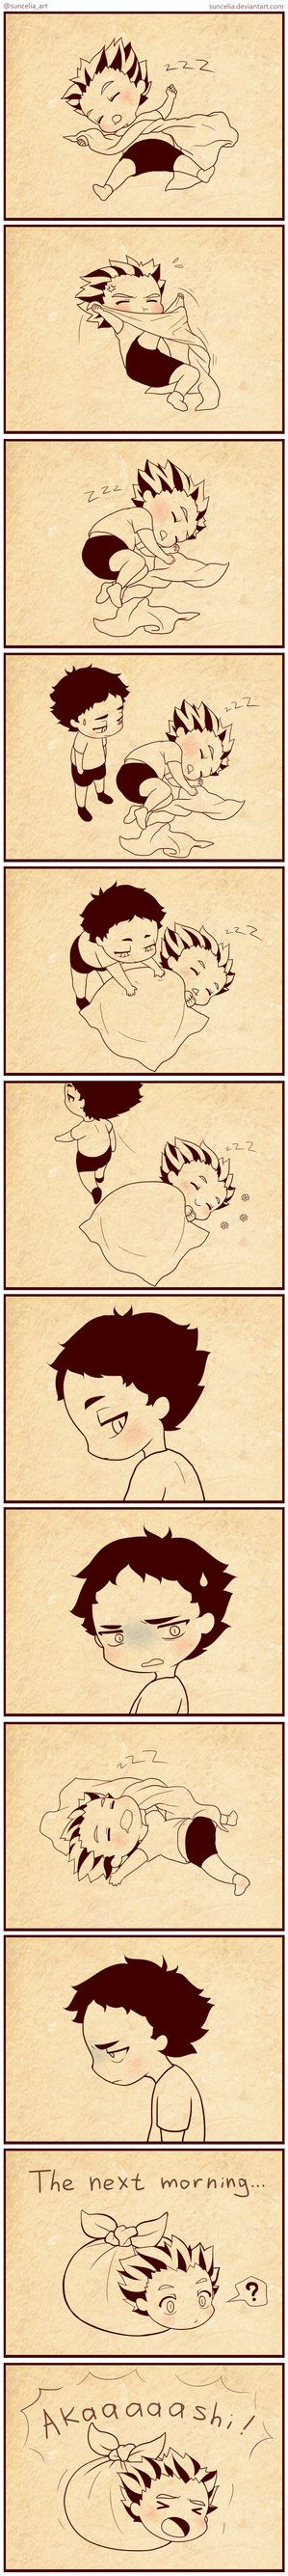 Haikyuu!! How do owls sleep by Suncelia.deviantart.com on @DeviantArt